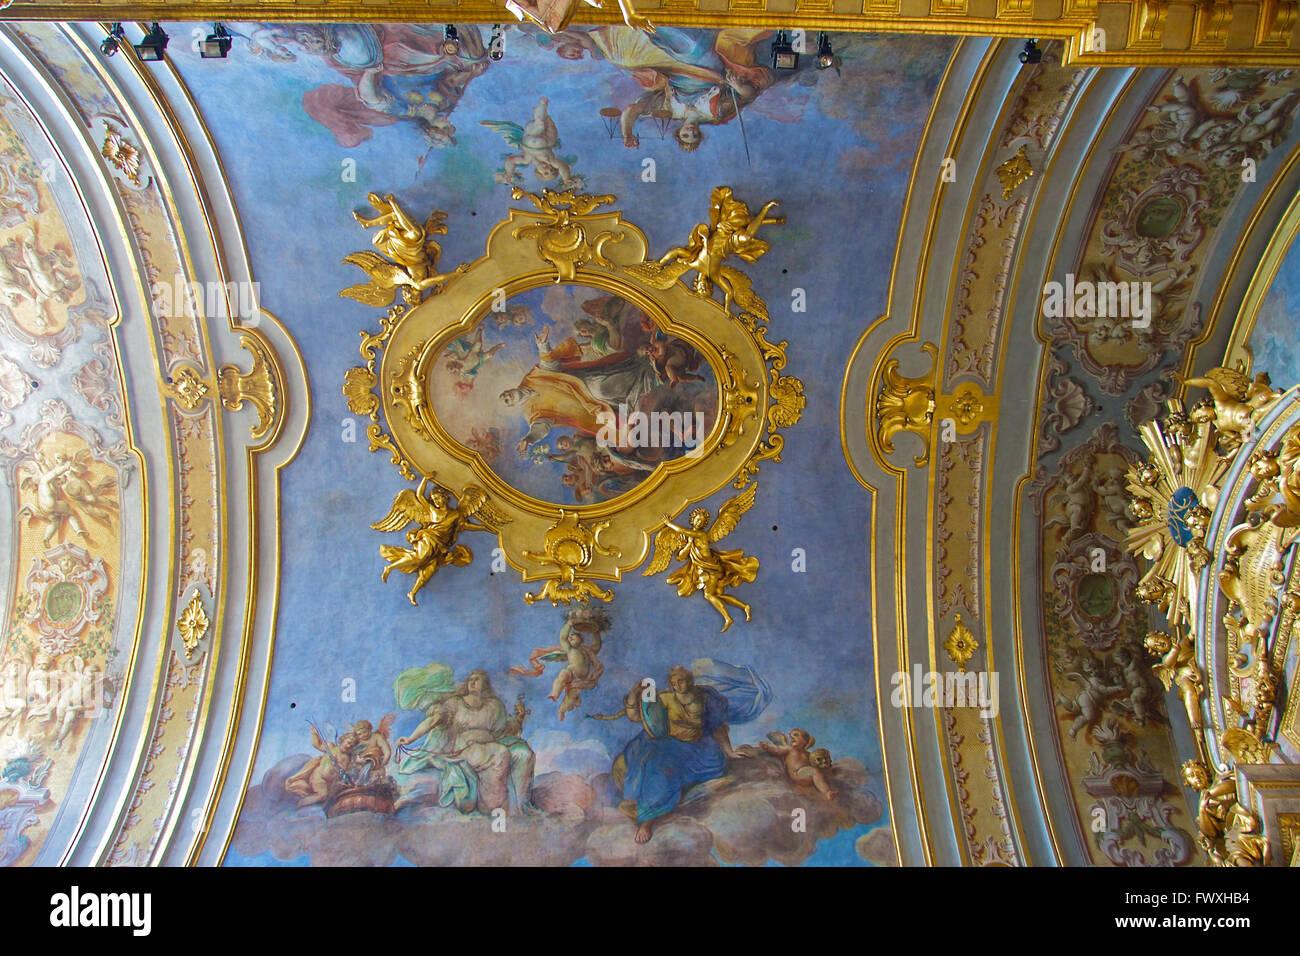 Part of the ceiling of Santa Maria sopra Minerva Church. Stock Photo